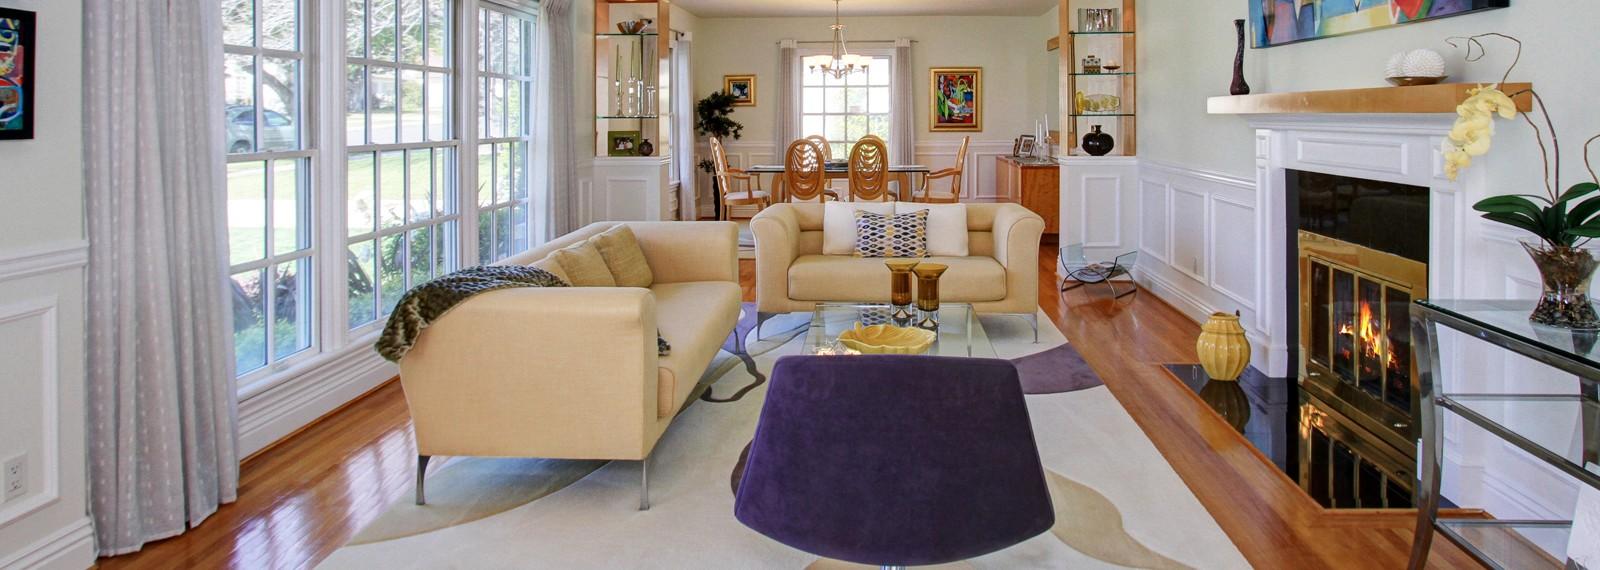 Living Room - Nina Kirkendall